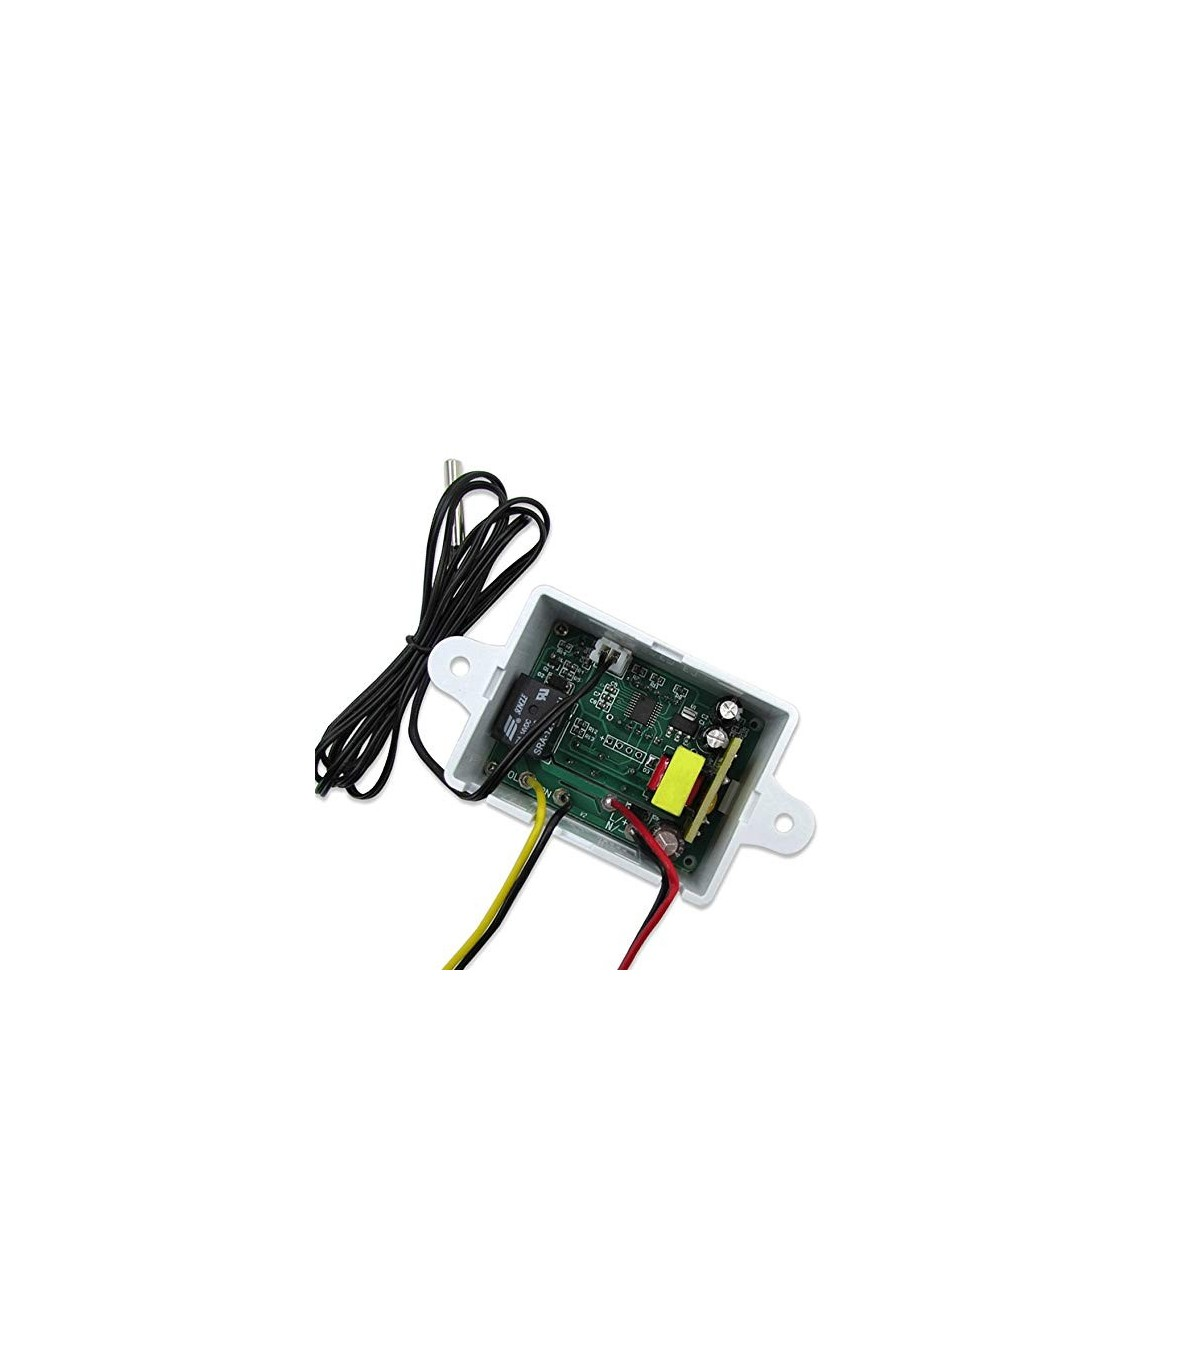 Termostat Digital Xh W 220v